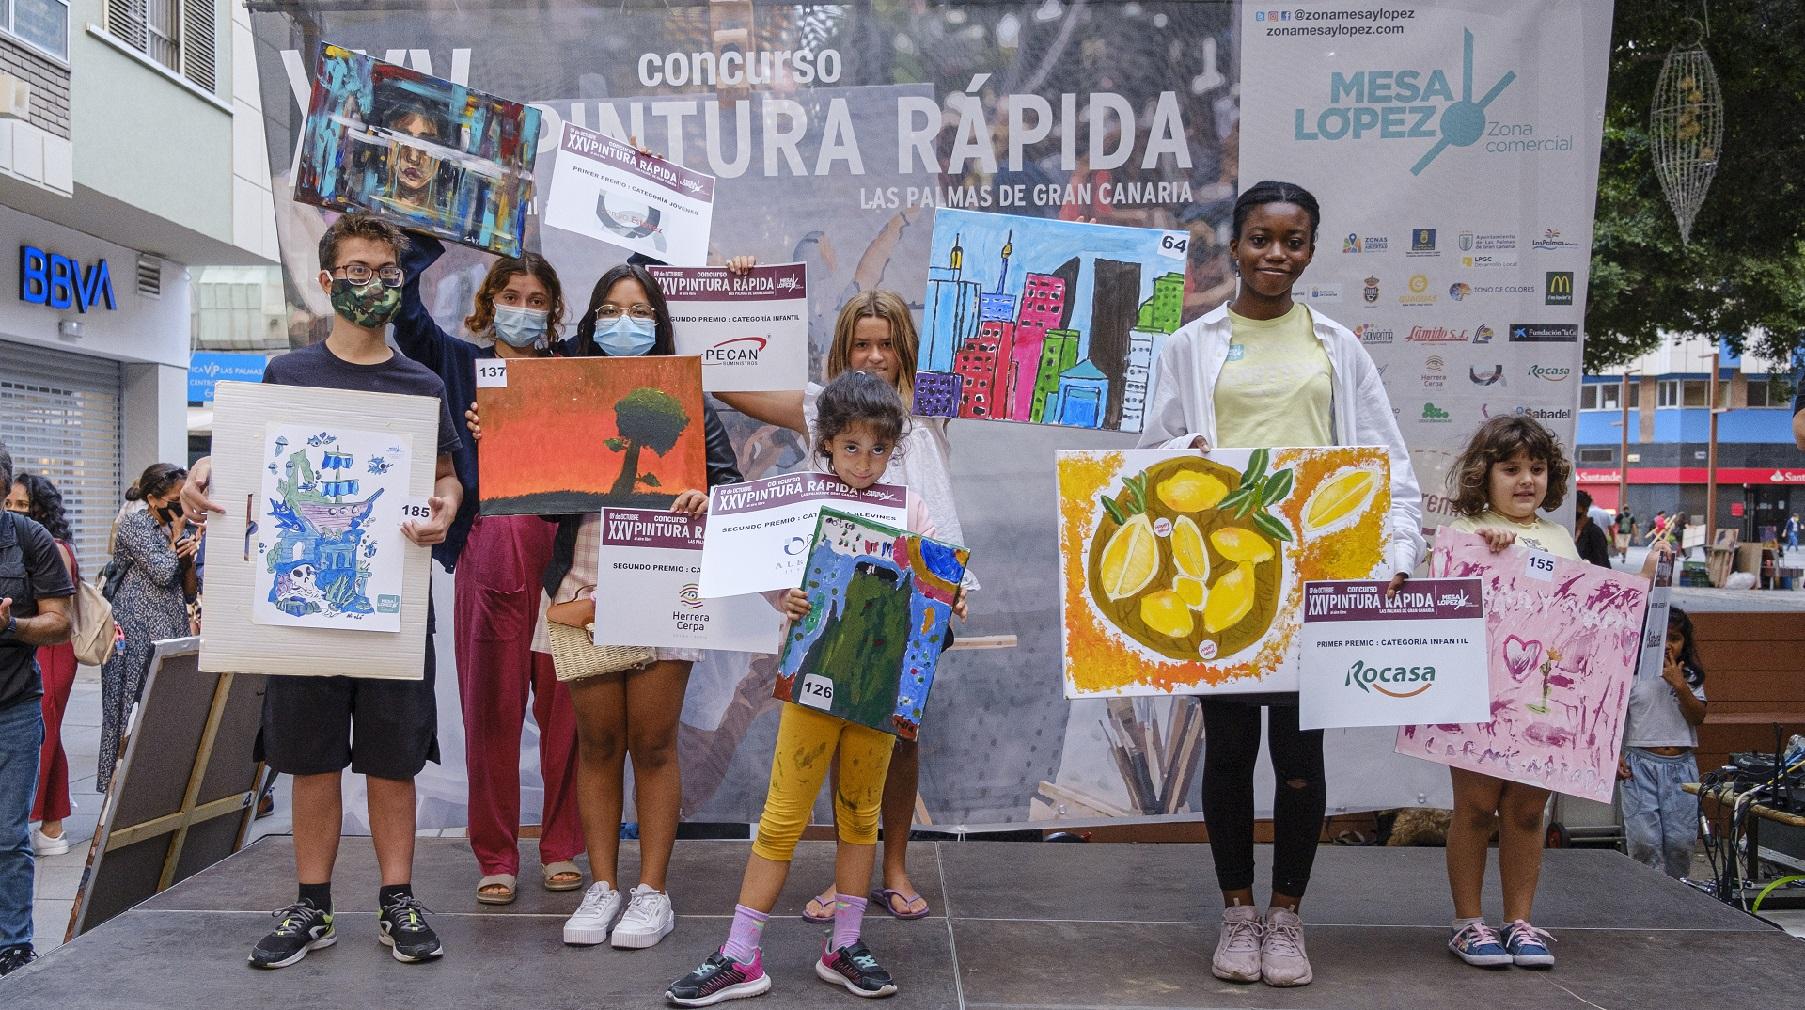 Ganadores junior XXV Concurso de Pintua Rápida al aire libre